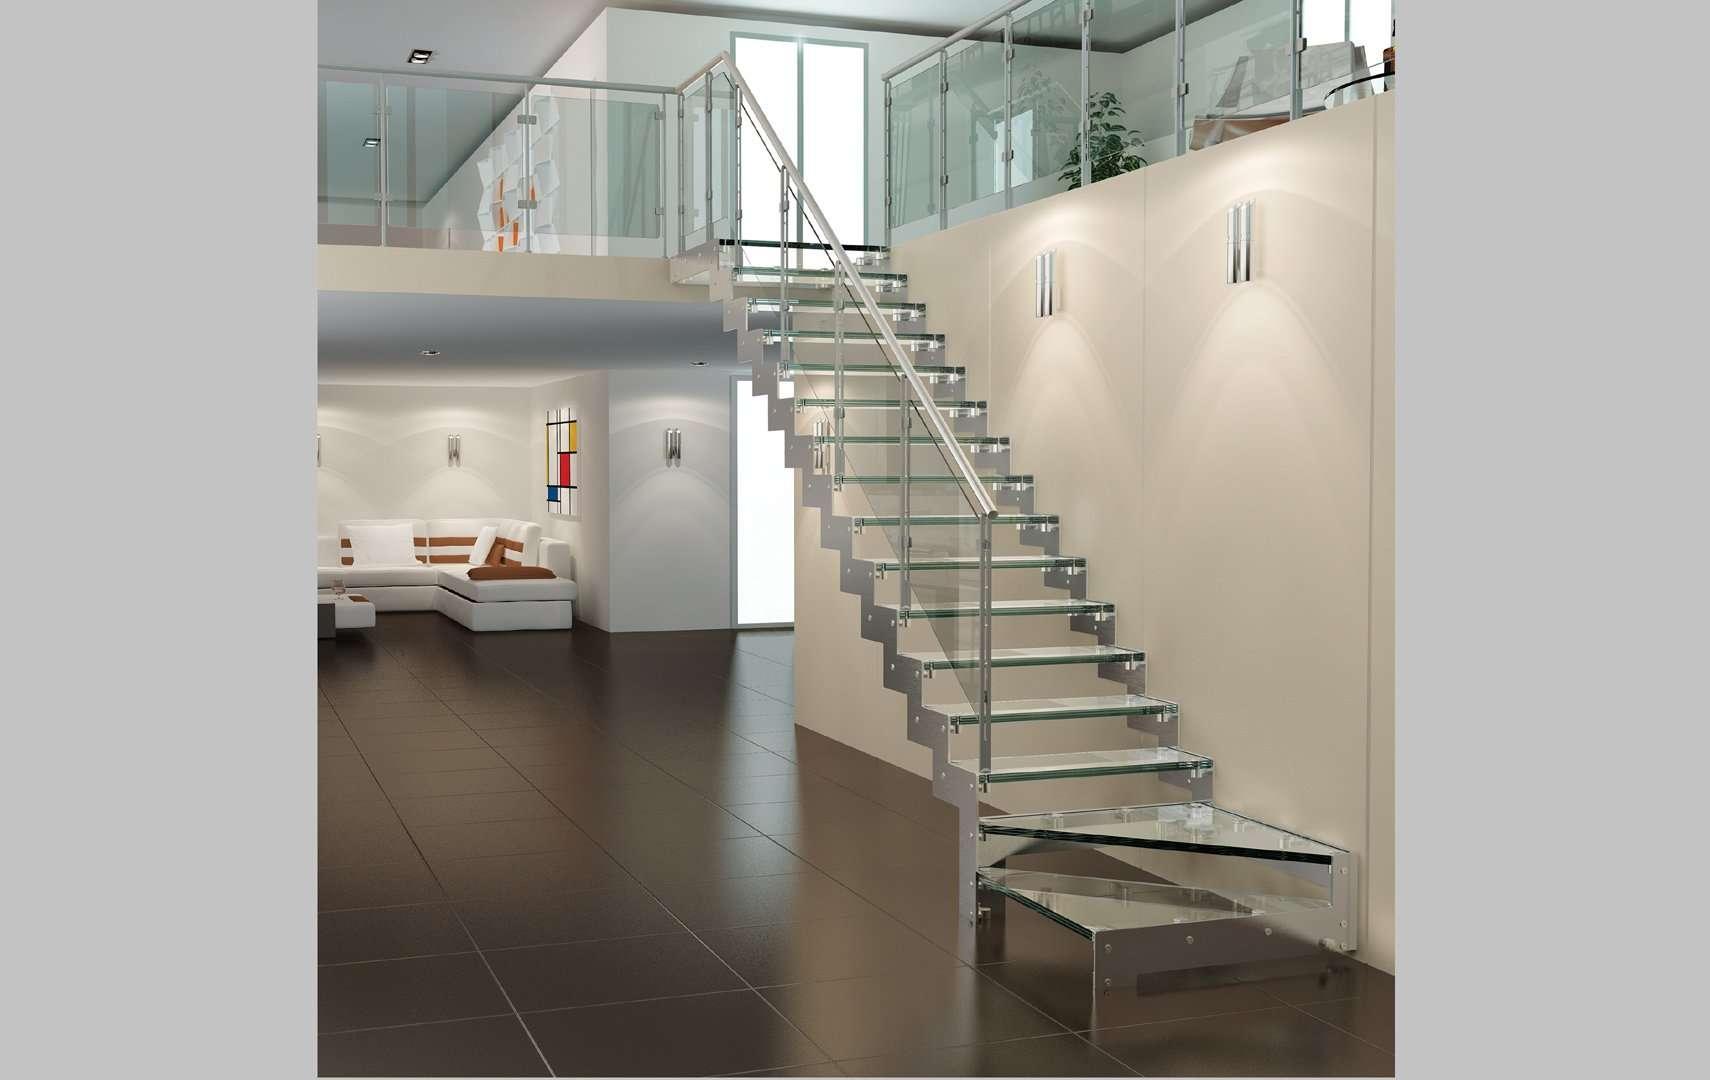 rexalglass escaleras italianas escaleras de madera maciza escaleras para interiores escaleras de madera escaleras escaleras de medidas escaleras